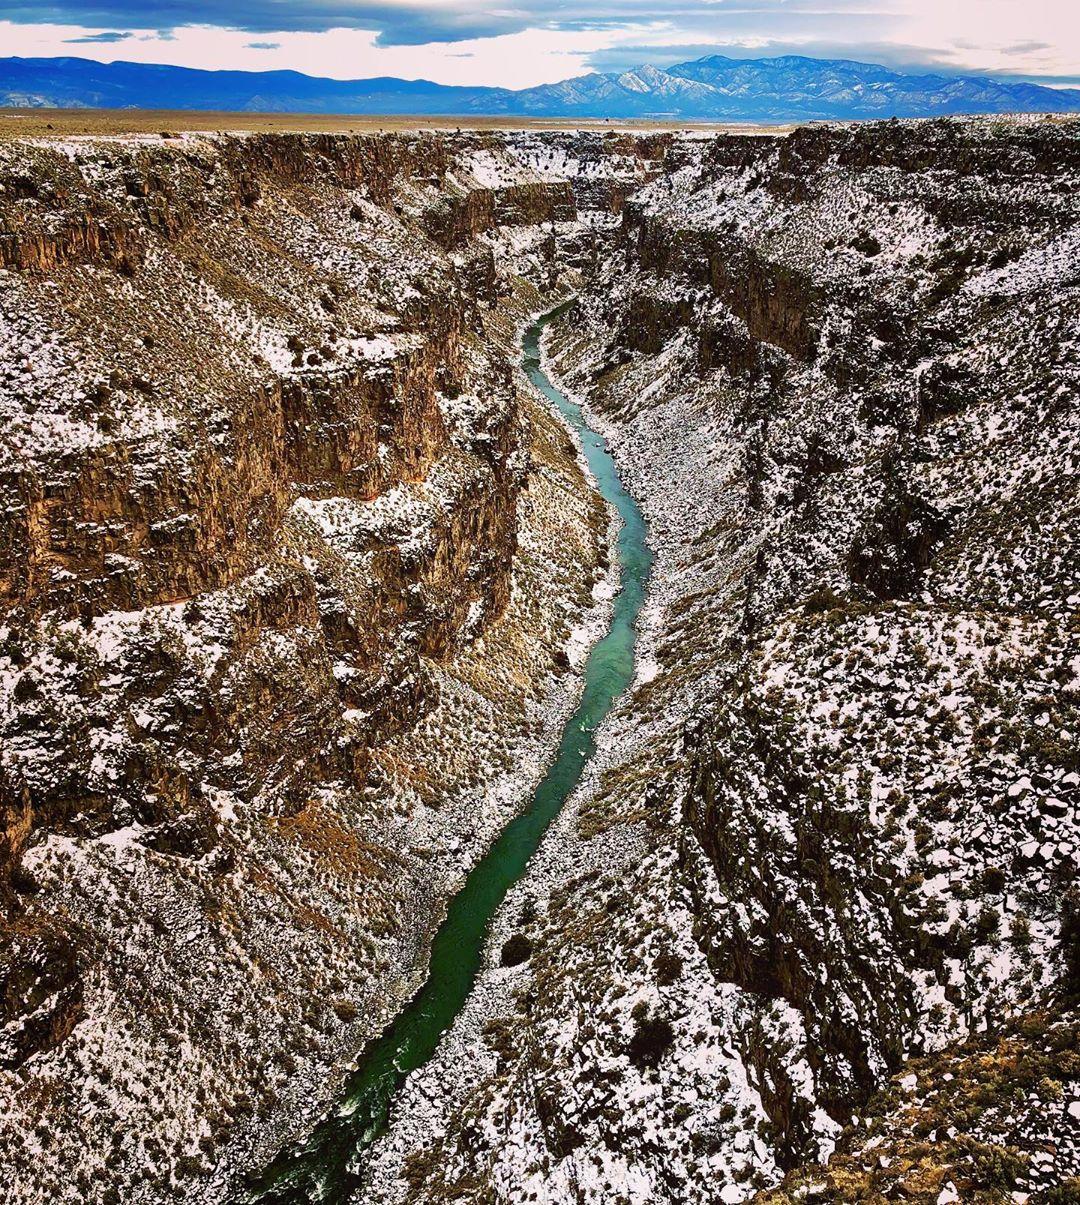 Rio Grande Gorge Bridge must-see places in new mexico